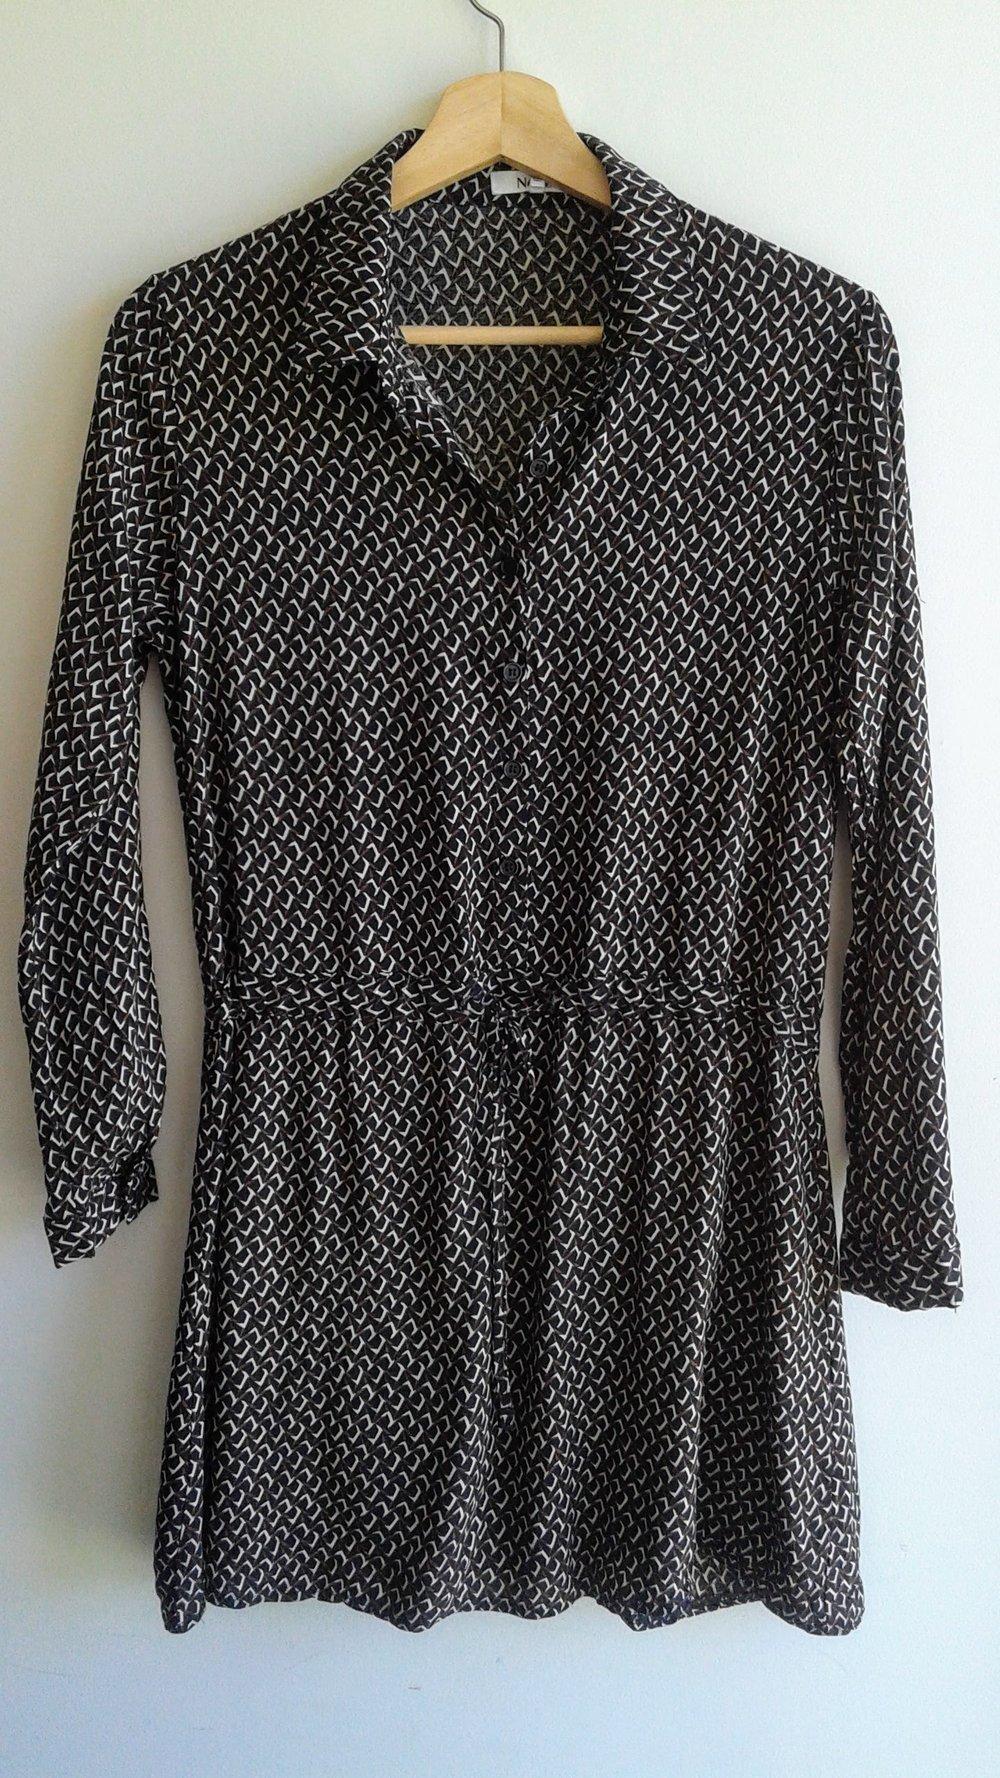 Noul dress; Size S, $38